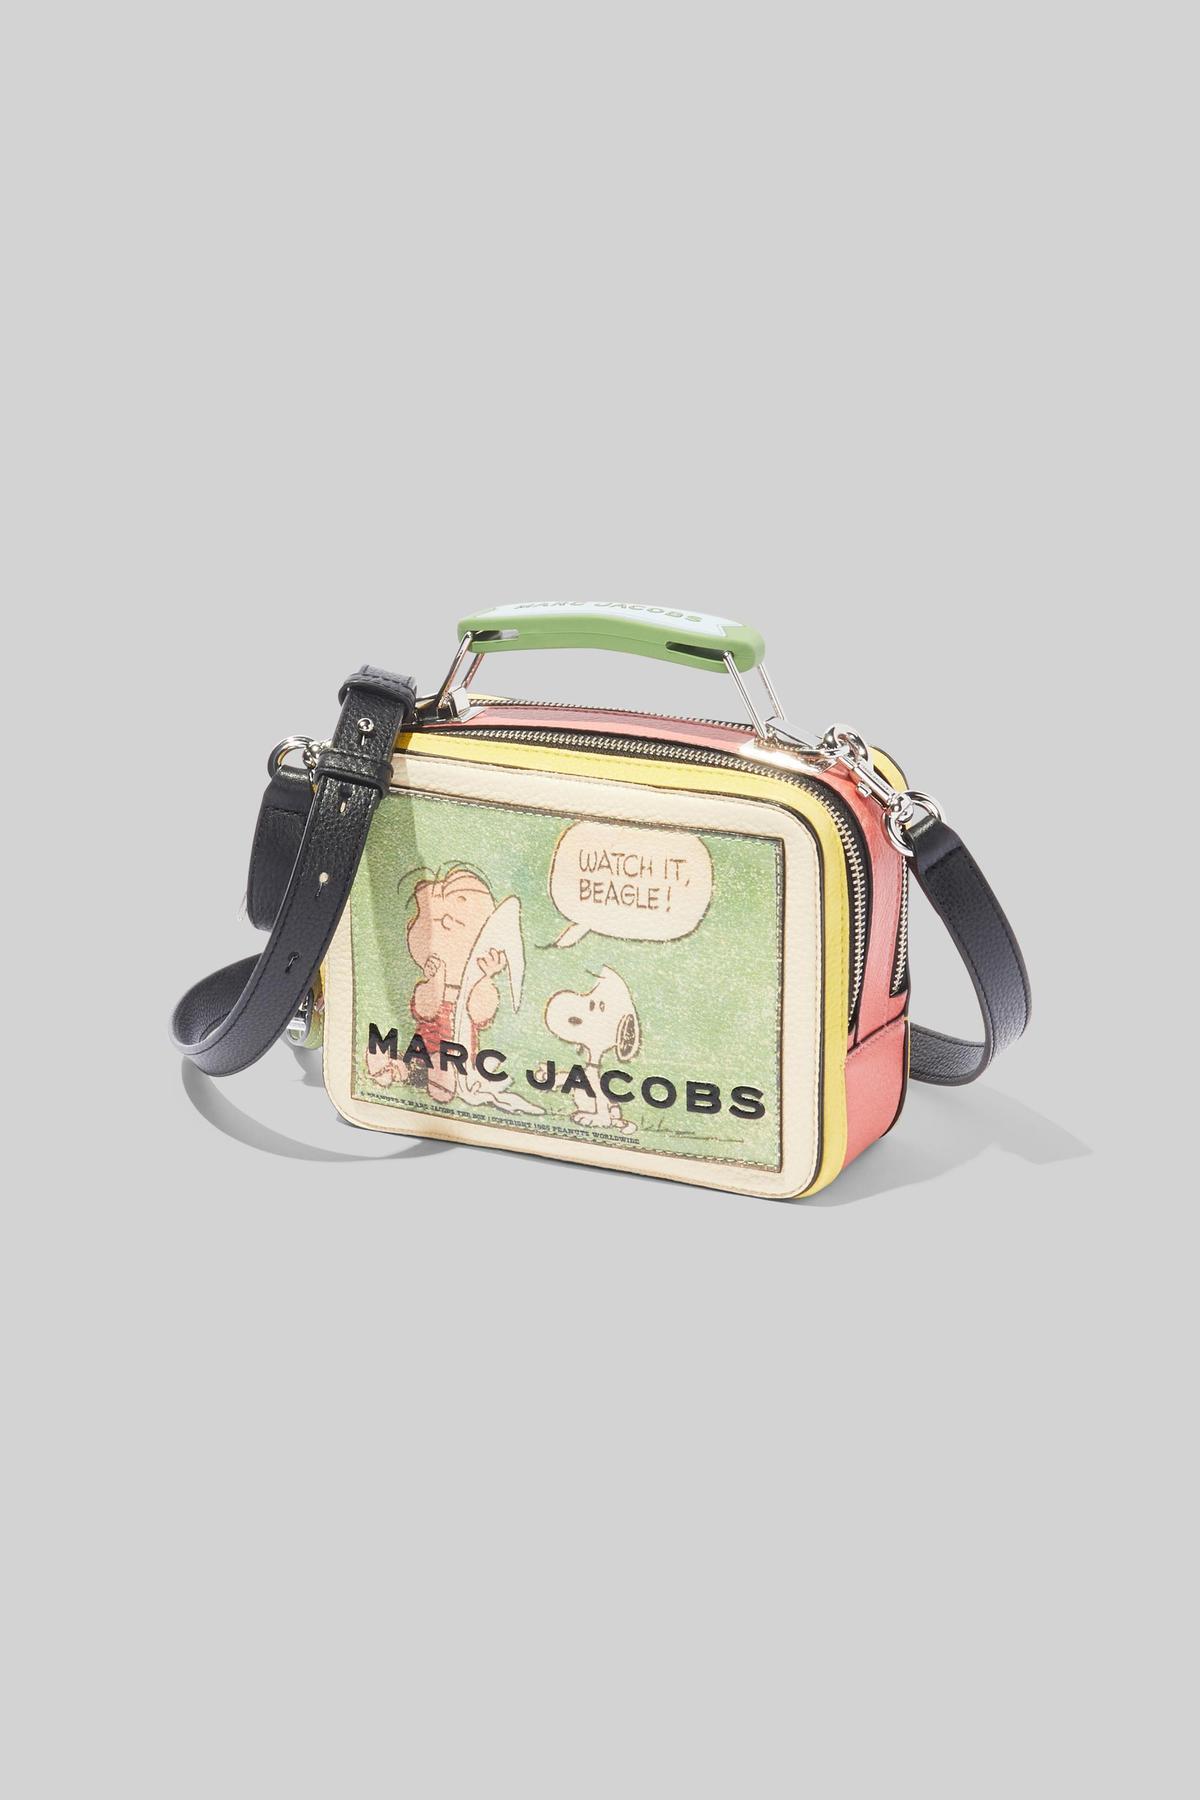 TheMarcJacobs x ThePeanuts漫畫圖案包款。NT$23,900(俊思提供)